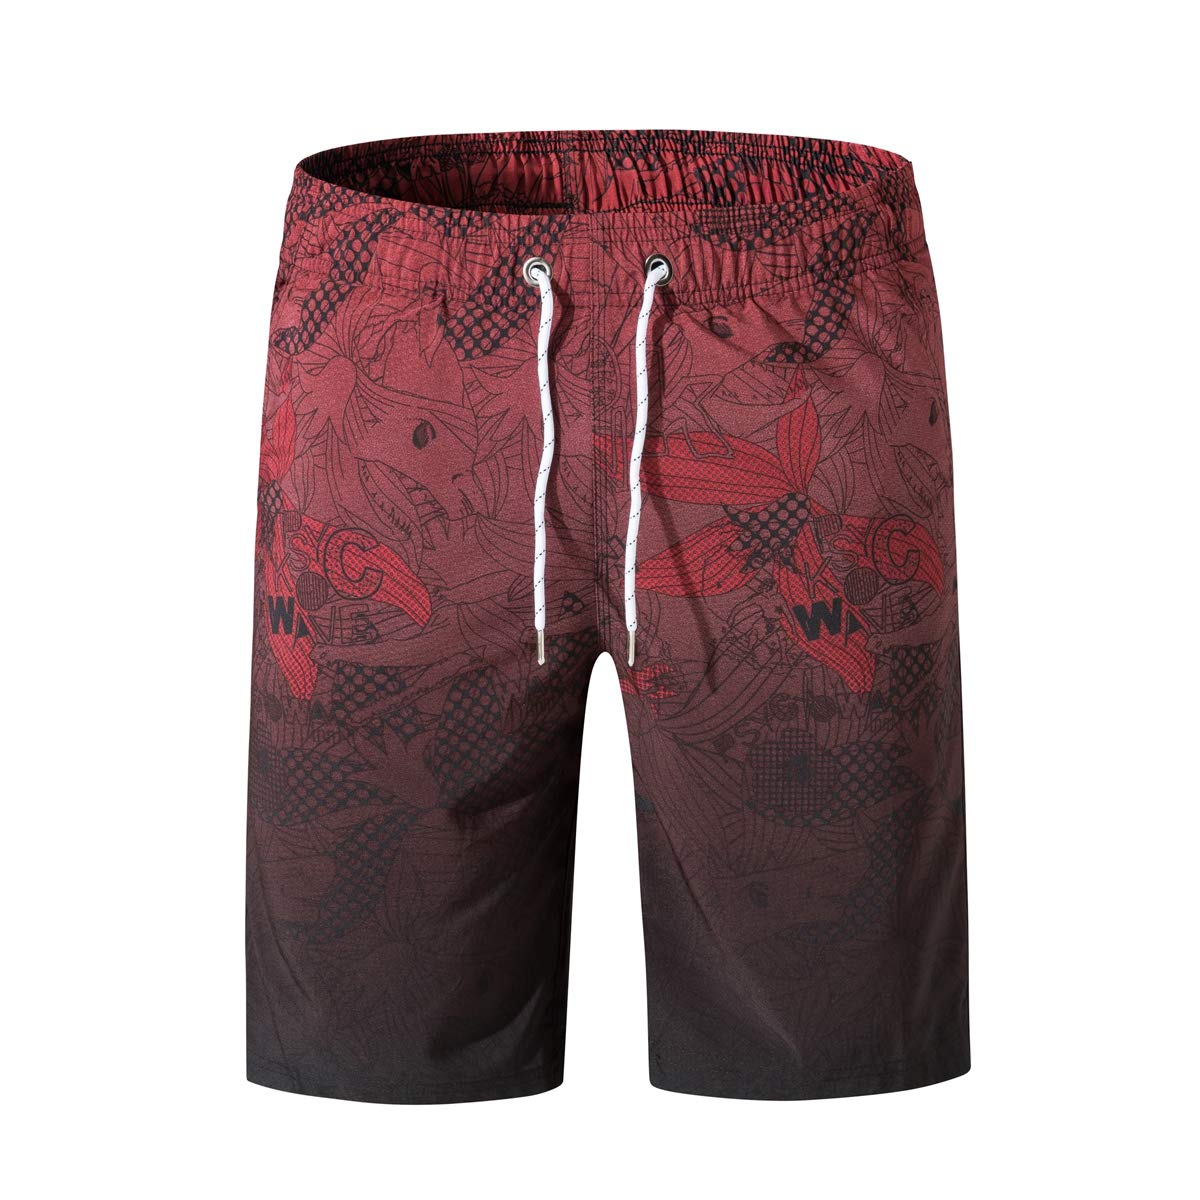 Gymleader Mens Swim Trunks Quick Dry Shorts with Mesh Lining Athletic Gym Running Shorts for Men Hawaiian Boardshorts